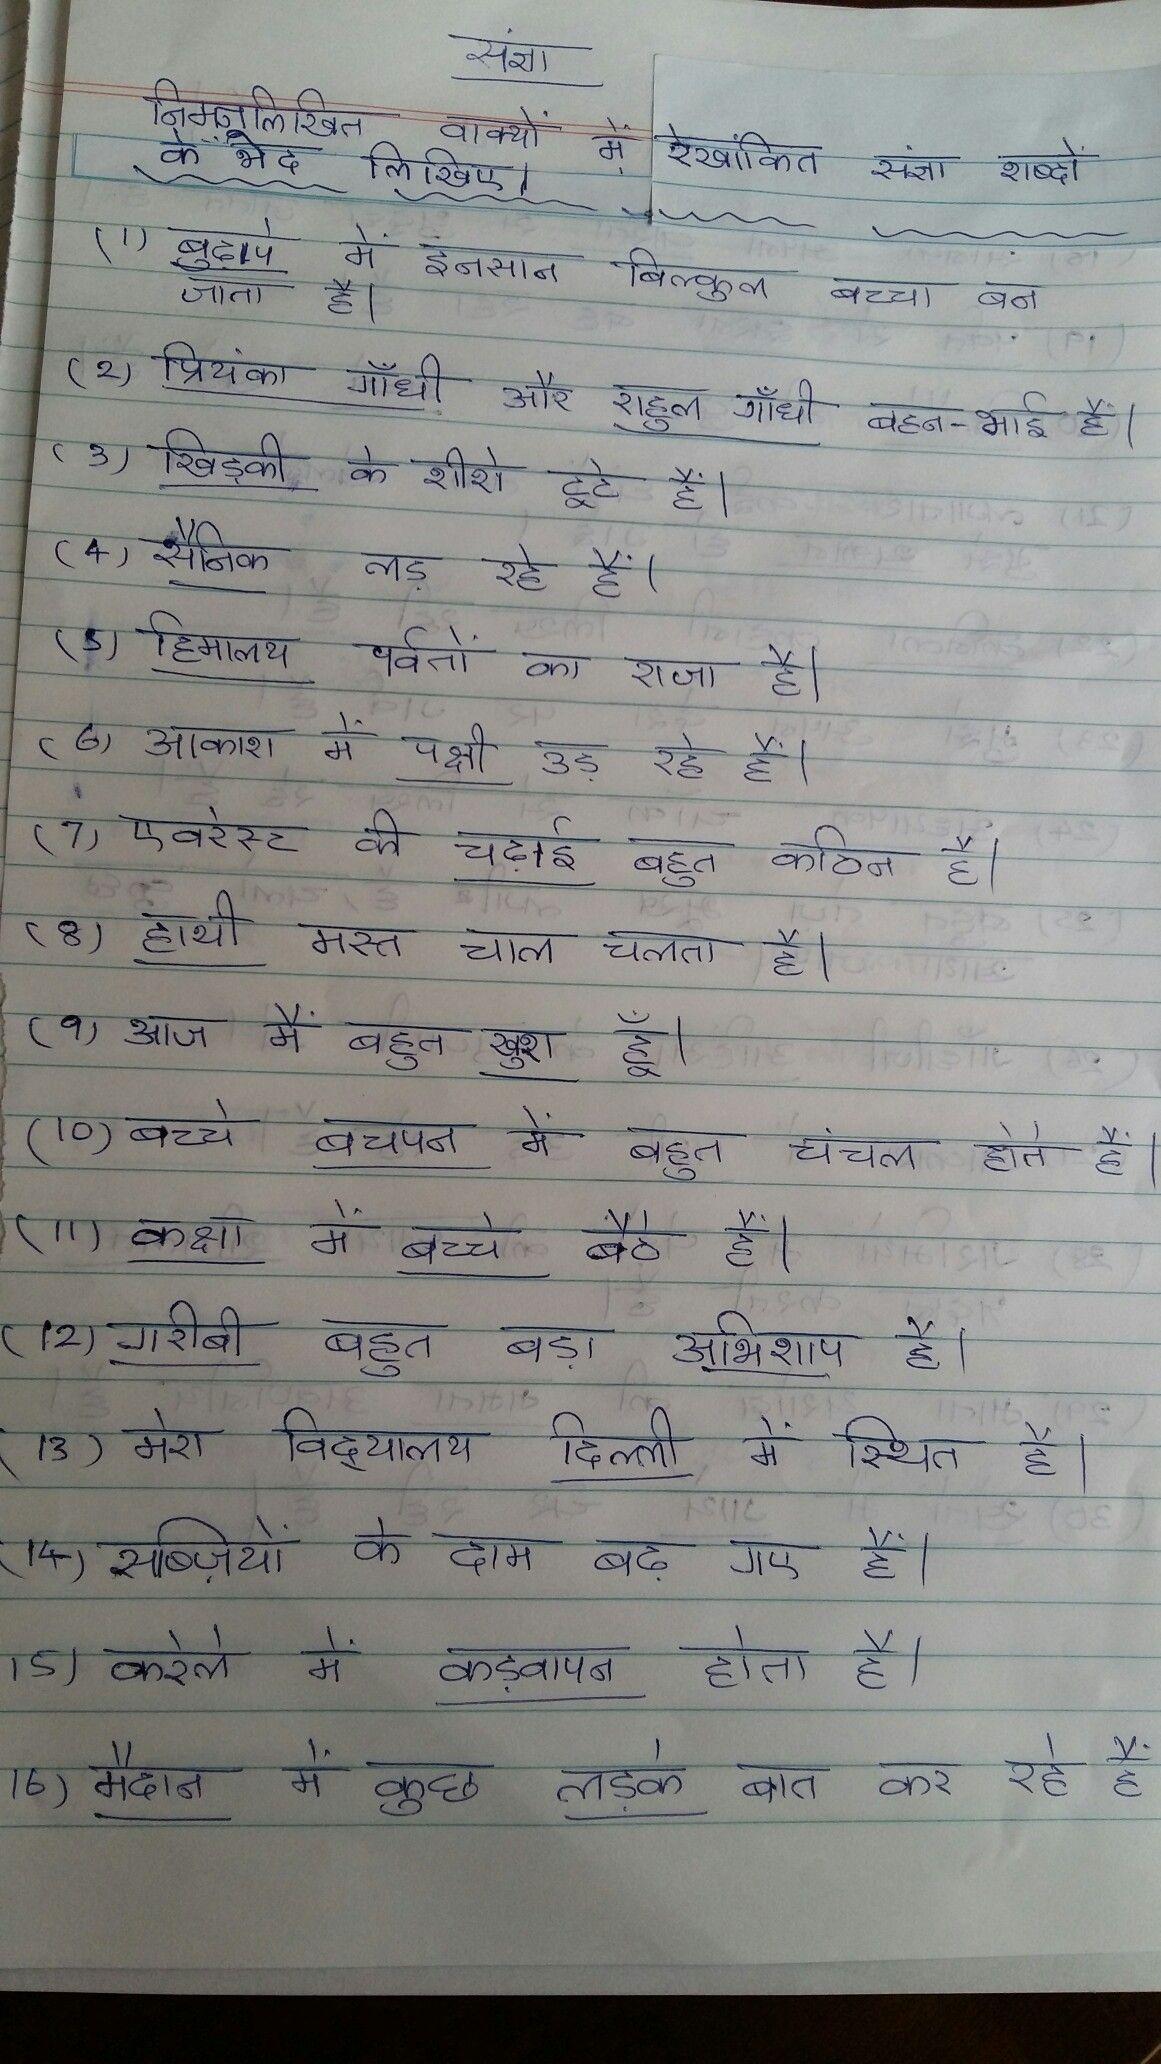 Hindi grammar WORKSHEETS-SANGYA ...PNV   Hindi worksheets [ 2064 x 1161 Pixel ]